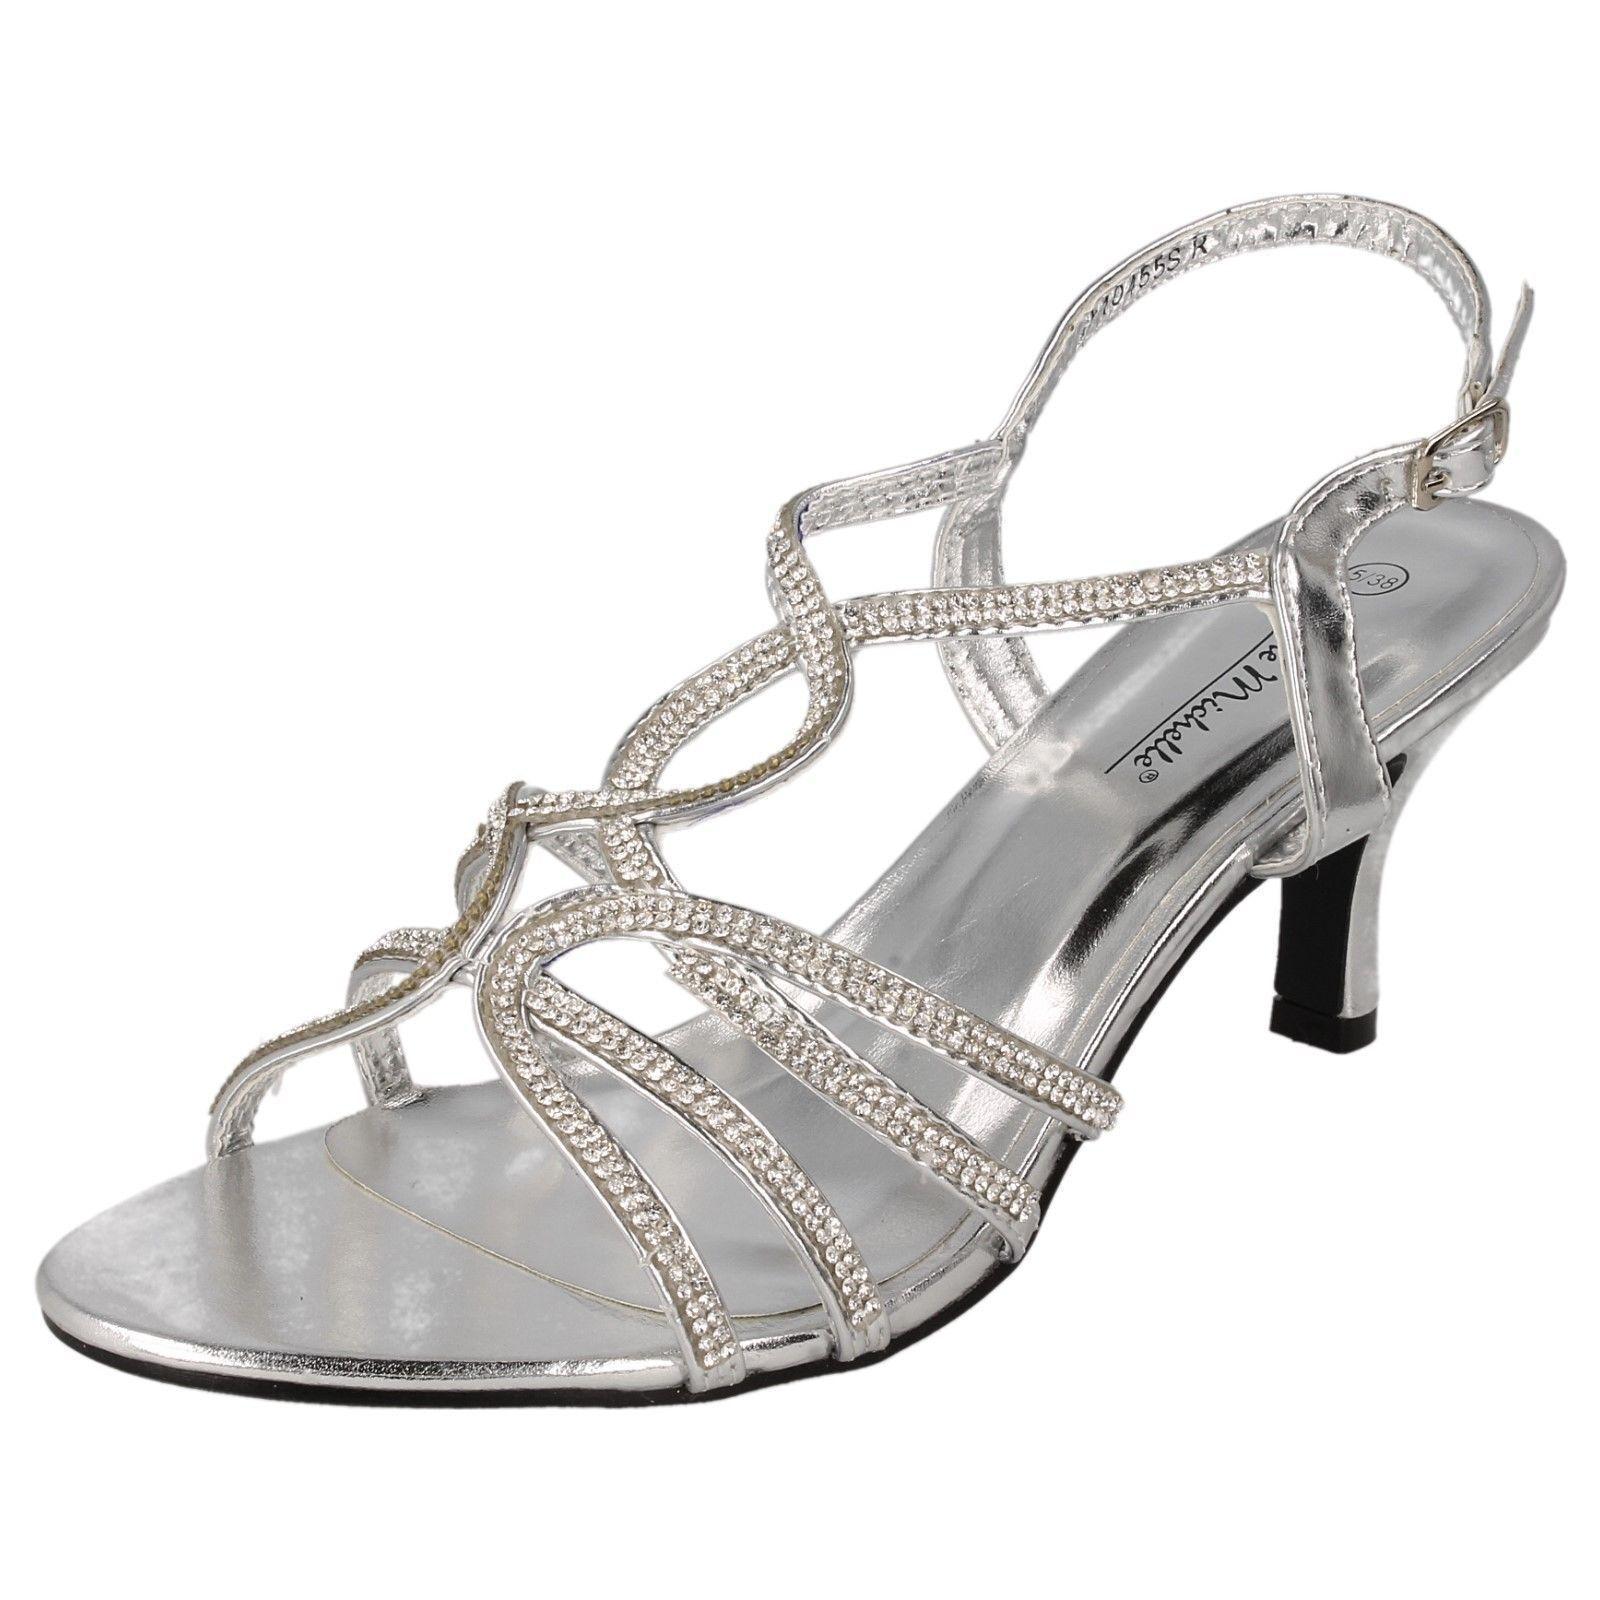 Anne Argent Michelle F10455 Mesdames Argent Anne Lanière Strass Chaussure (32B) 59aec2